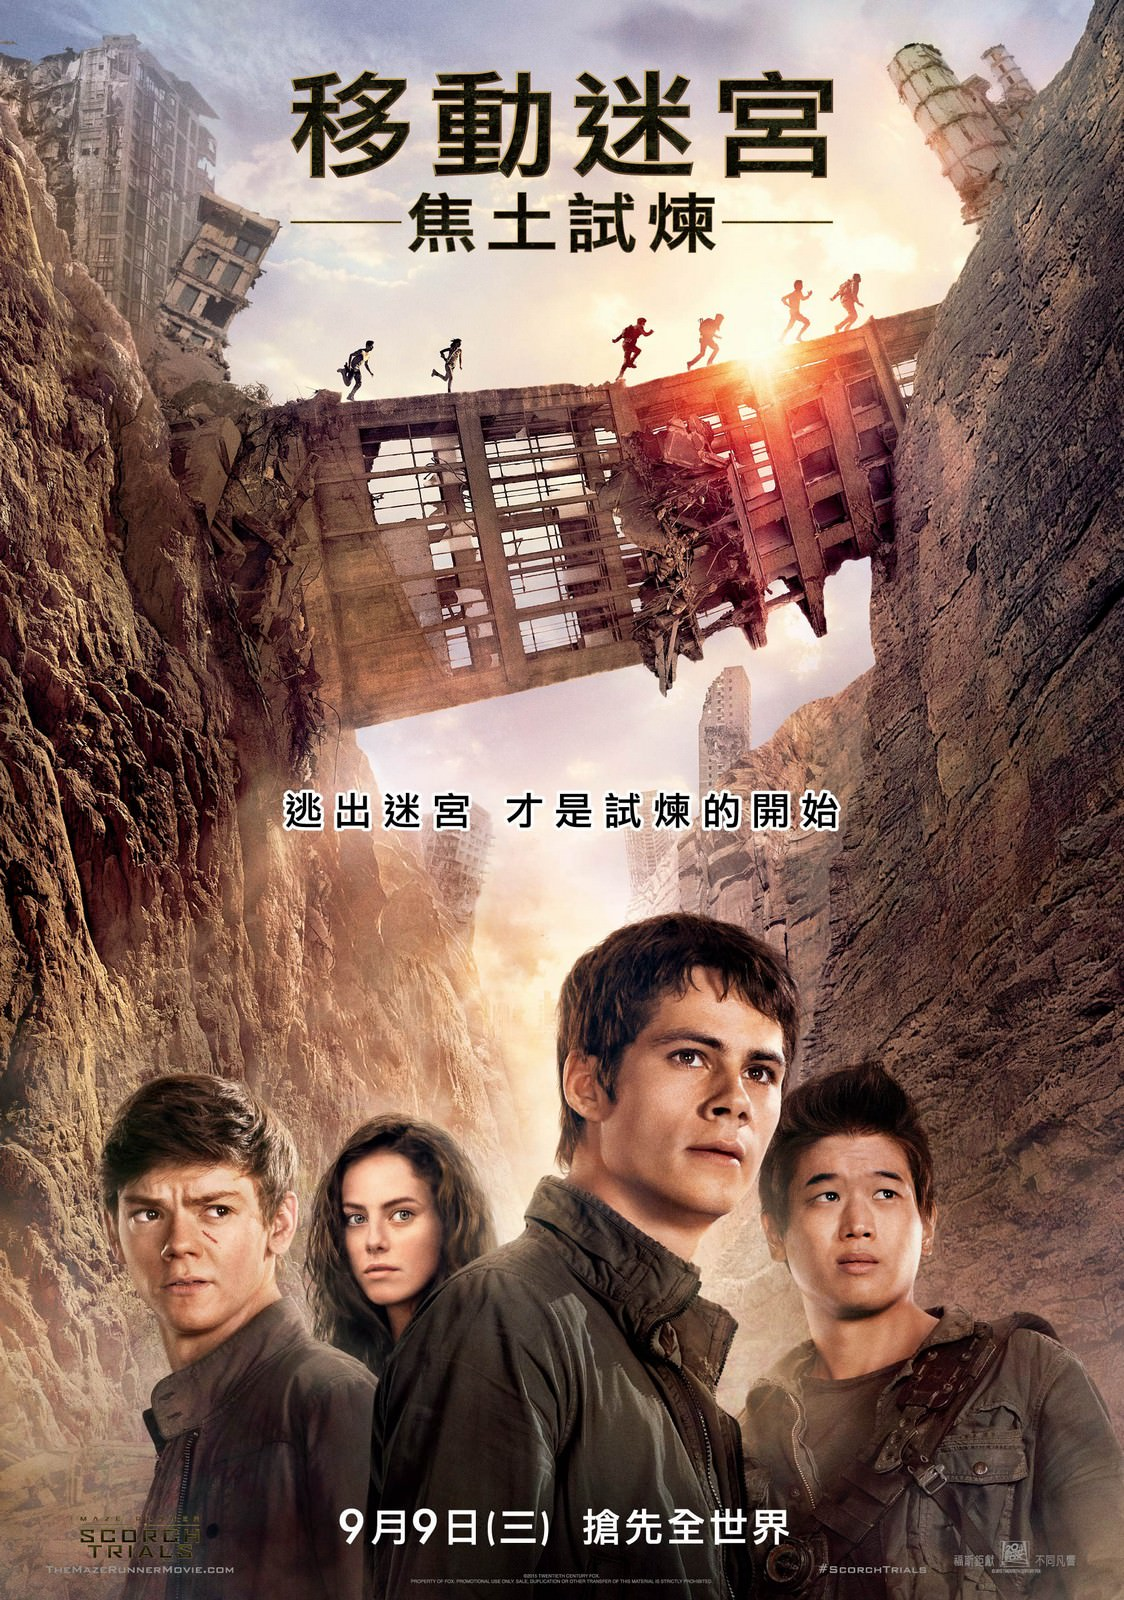 Movie, Maze Runner: The Scorch Trials(美國, 2015) / 移動迷宮:焦土試煉(台灣.香港) / 移动迷宫2(中國), 電影海報, 台灣